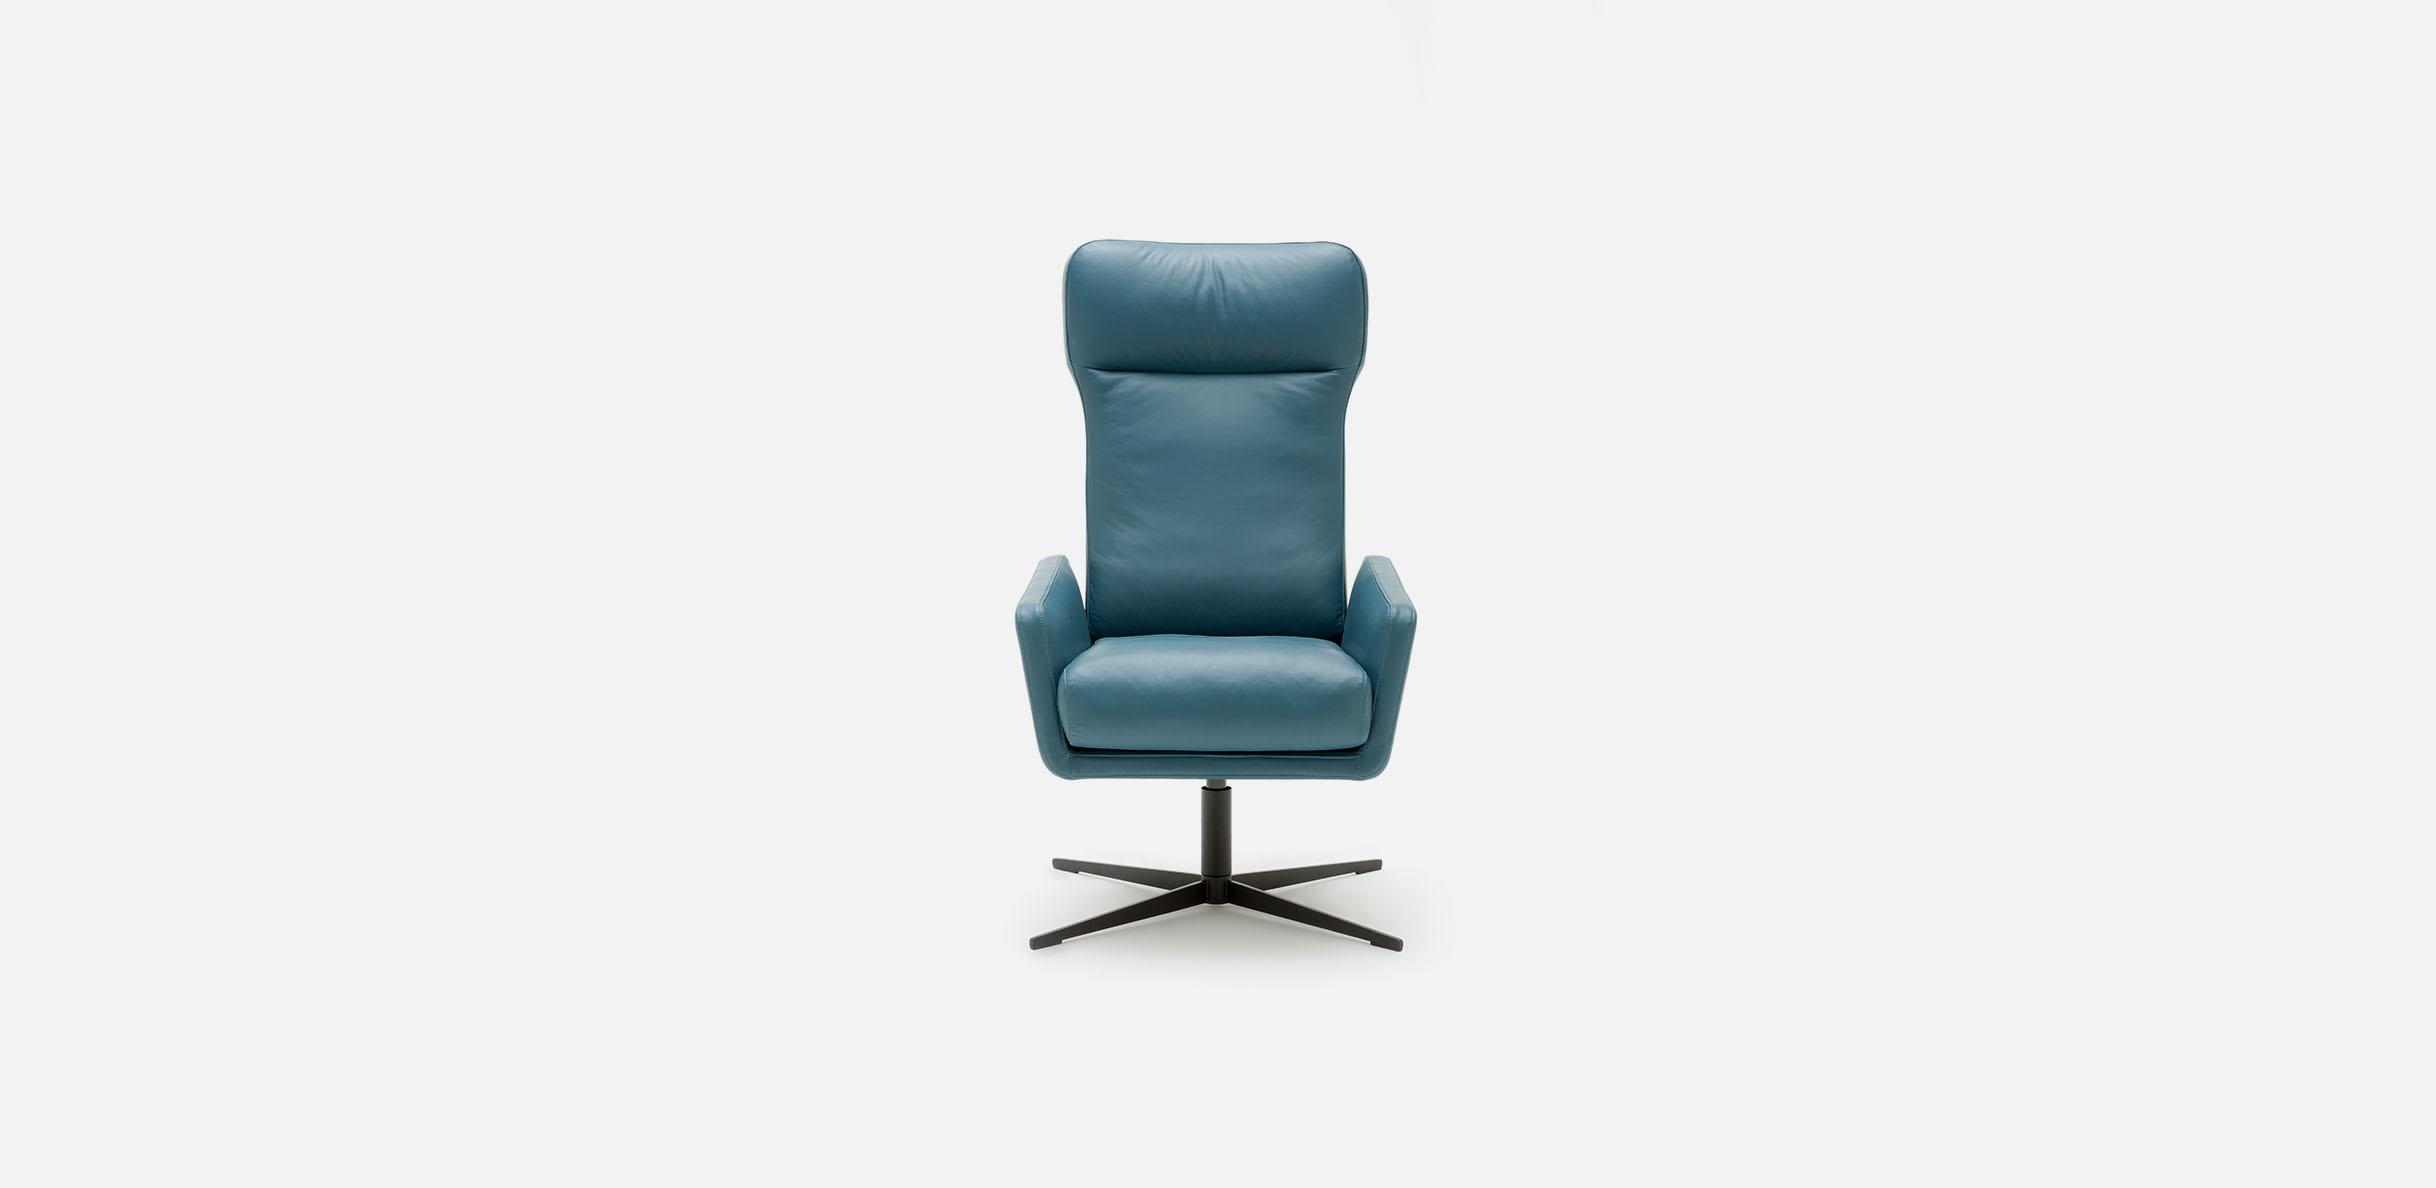 rolf benz sessel 560 preis williamflooring. Black Bedroom Furniture Sets. Home Design Ideas